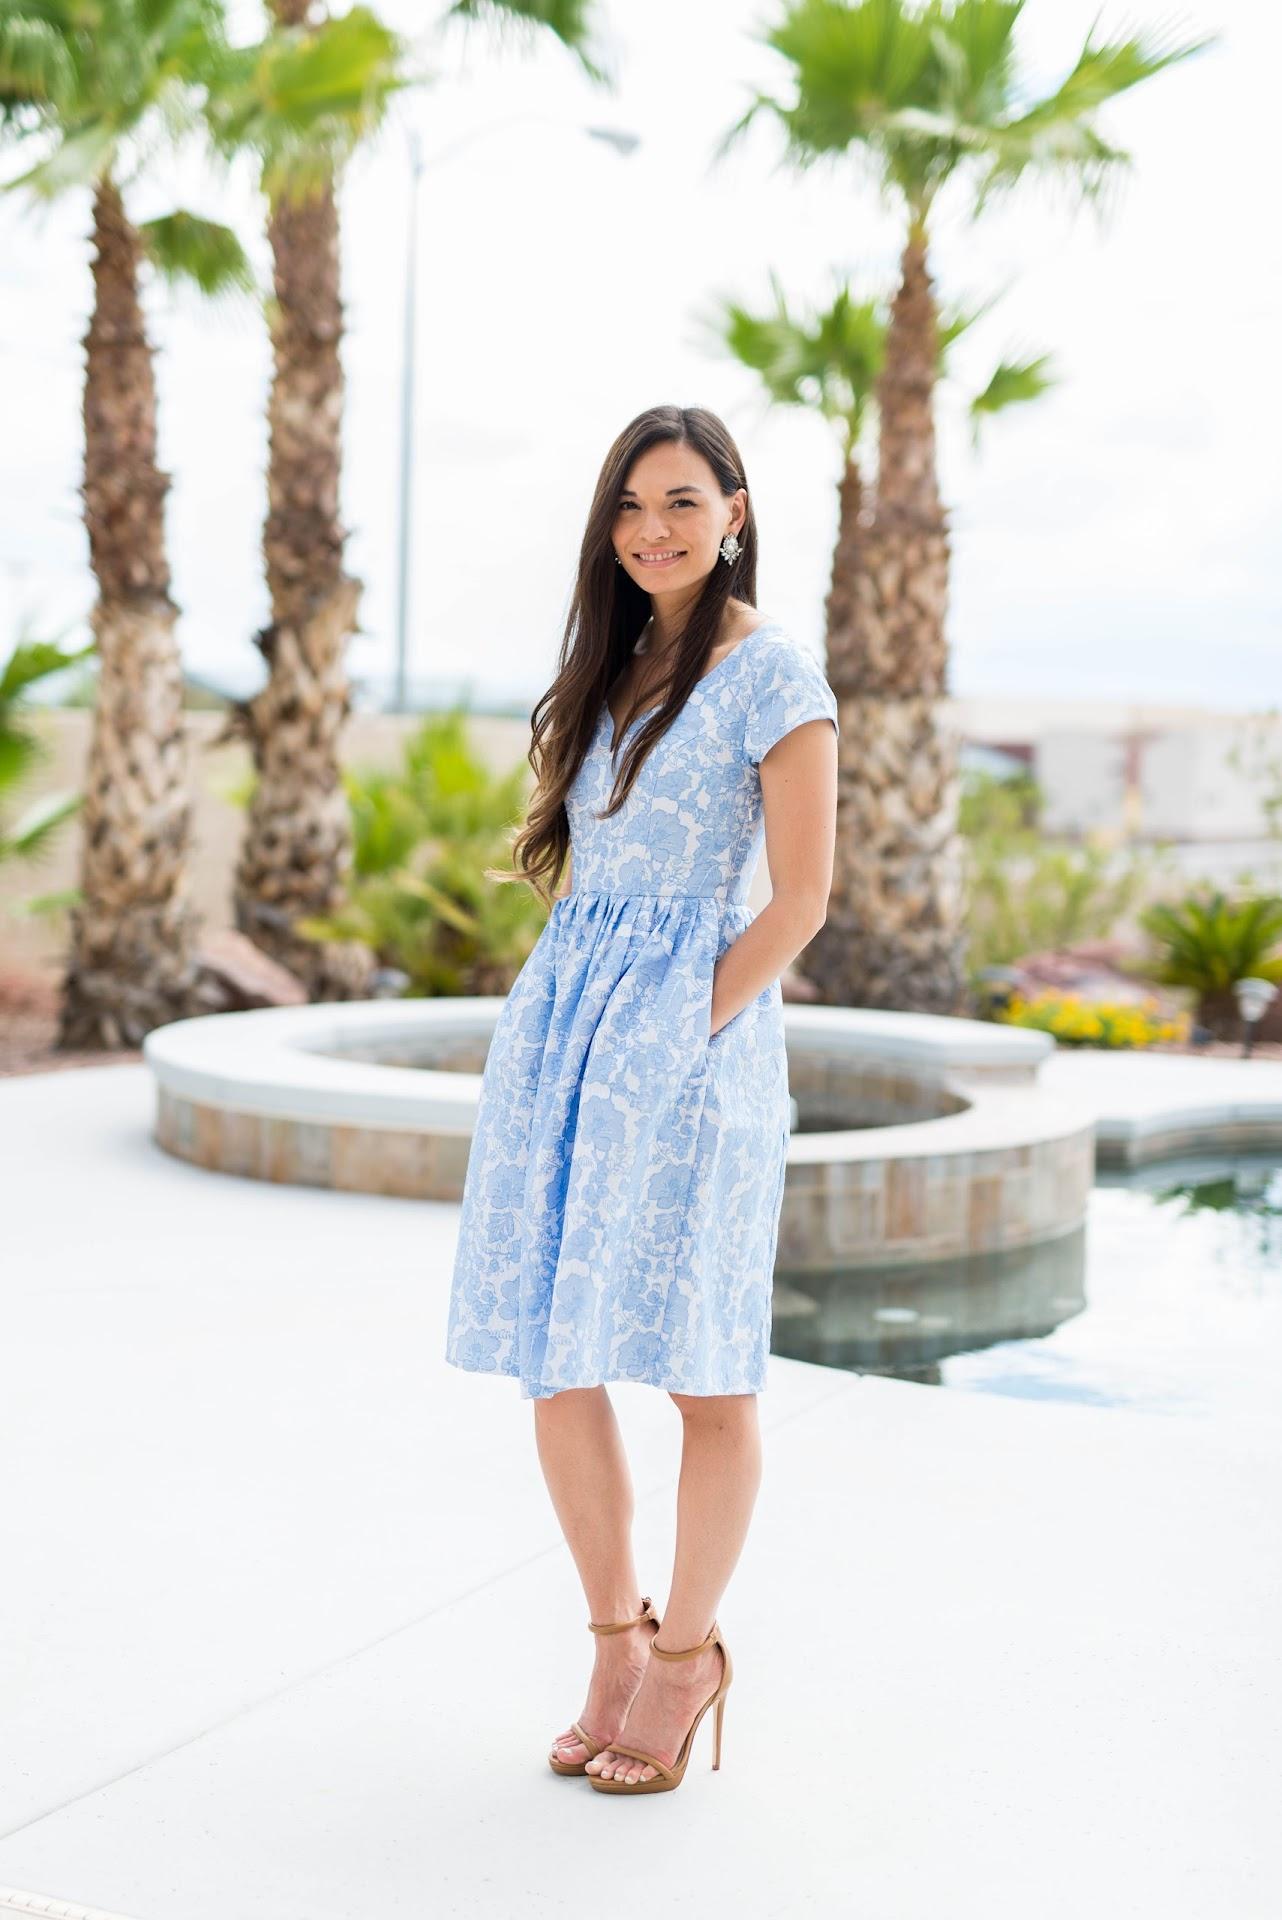 mormon fashion blogger, modest style blogger, lds, asian, korean, san francisco bay area fashion blogger, california, eshakti dress review, forever 21 faux leather ankle strap sandals, ysl dupes